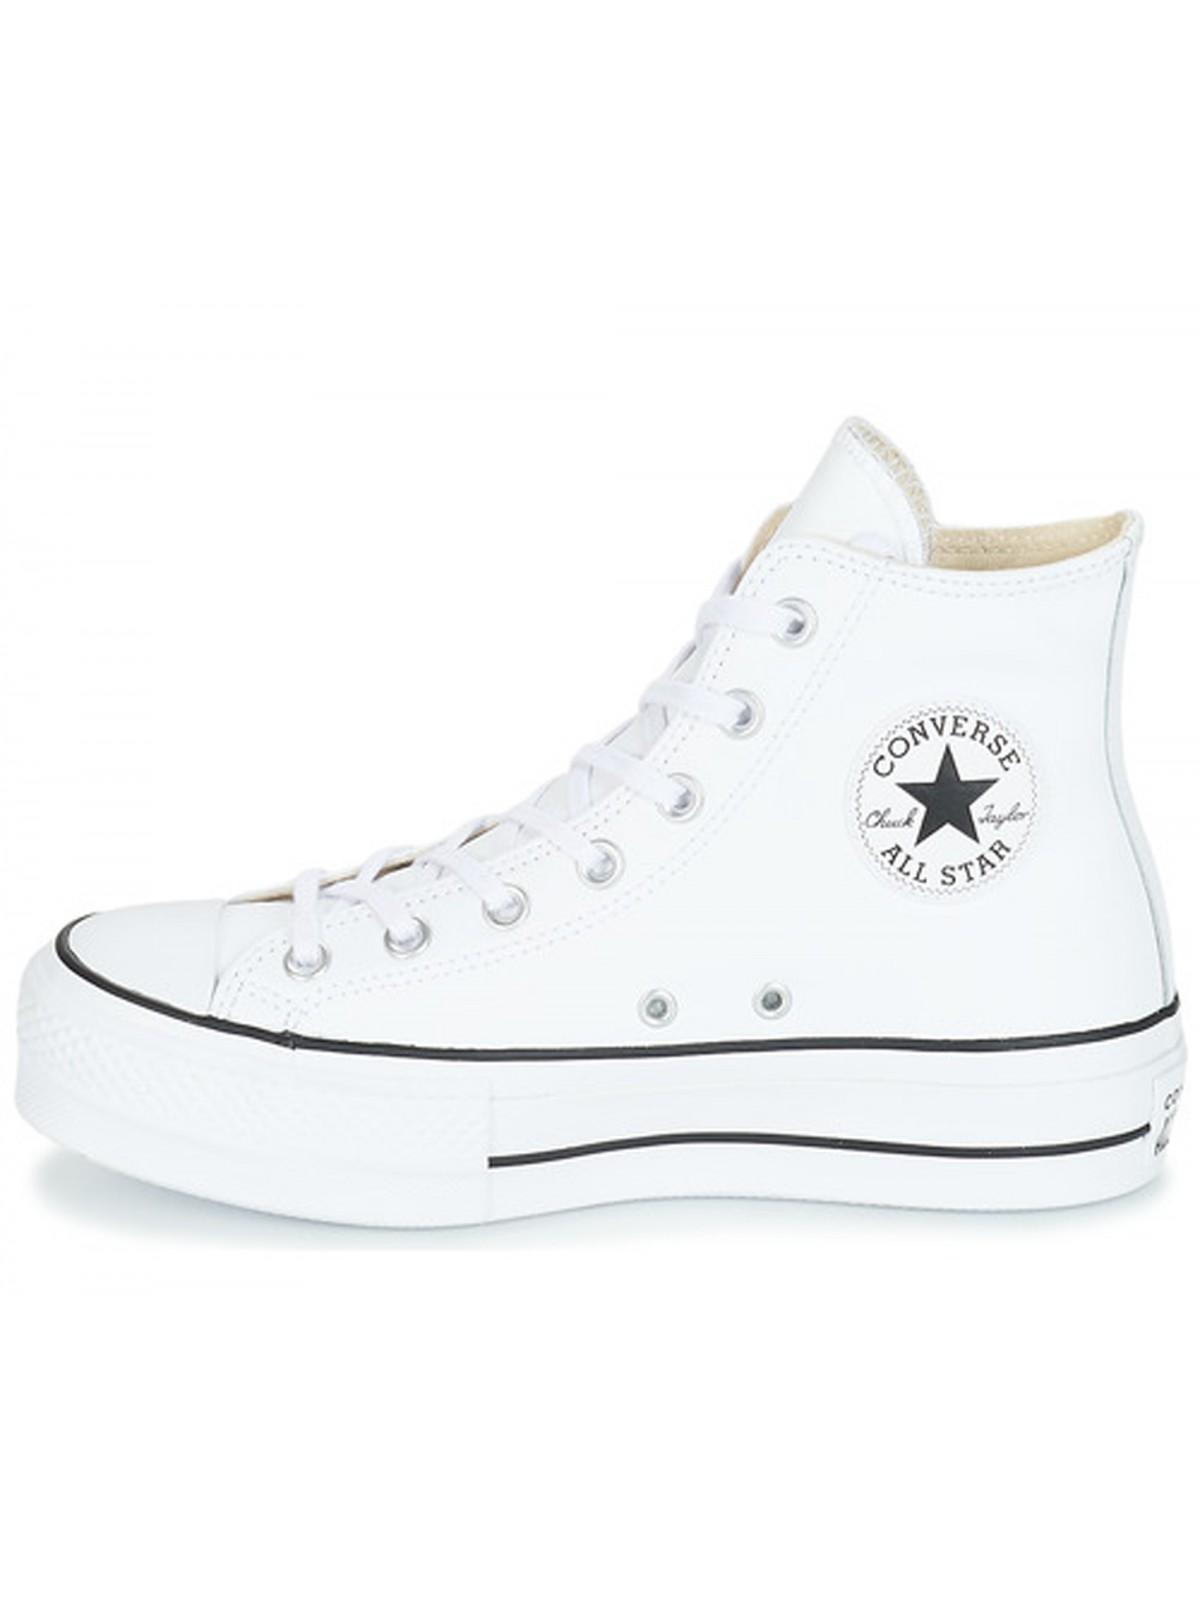 Converse Chuck Taylor all star Lift cuir plateforme blanc